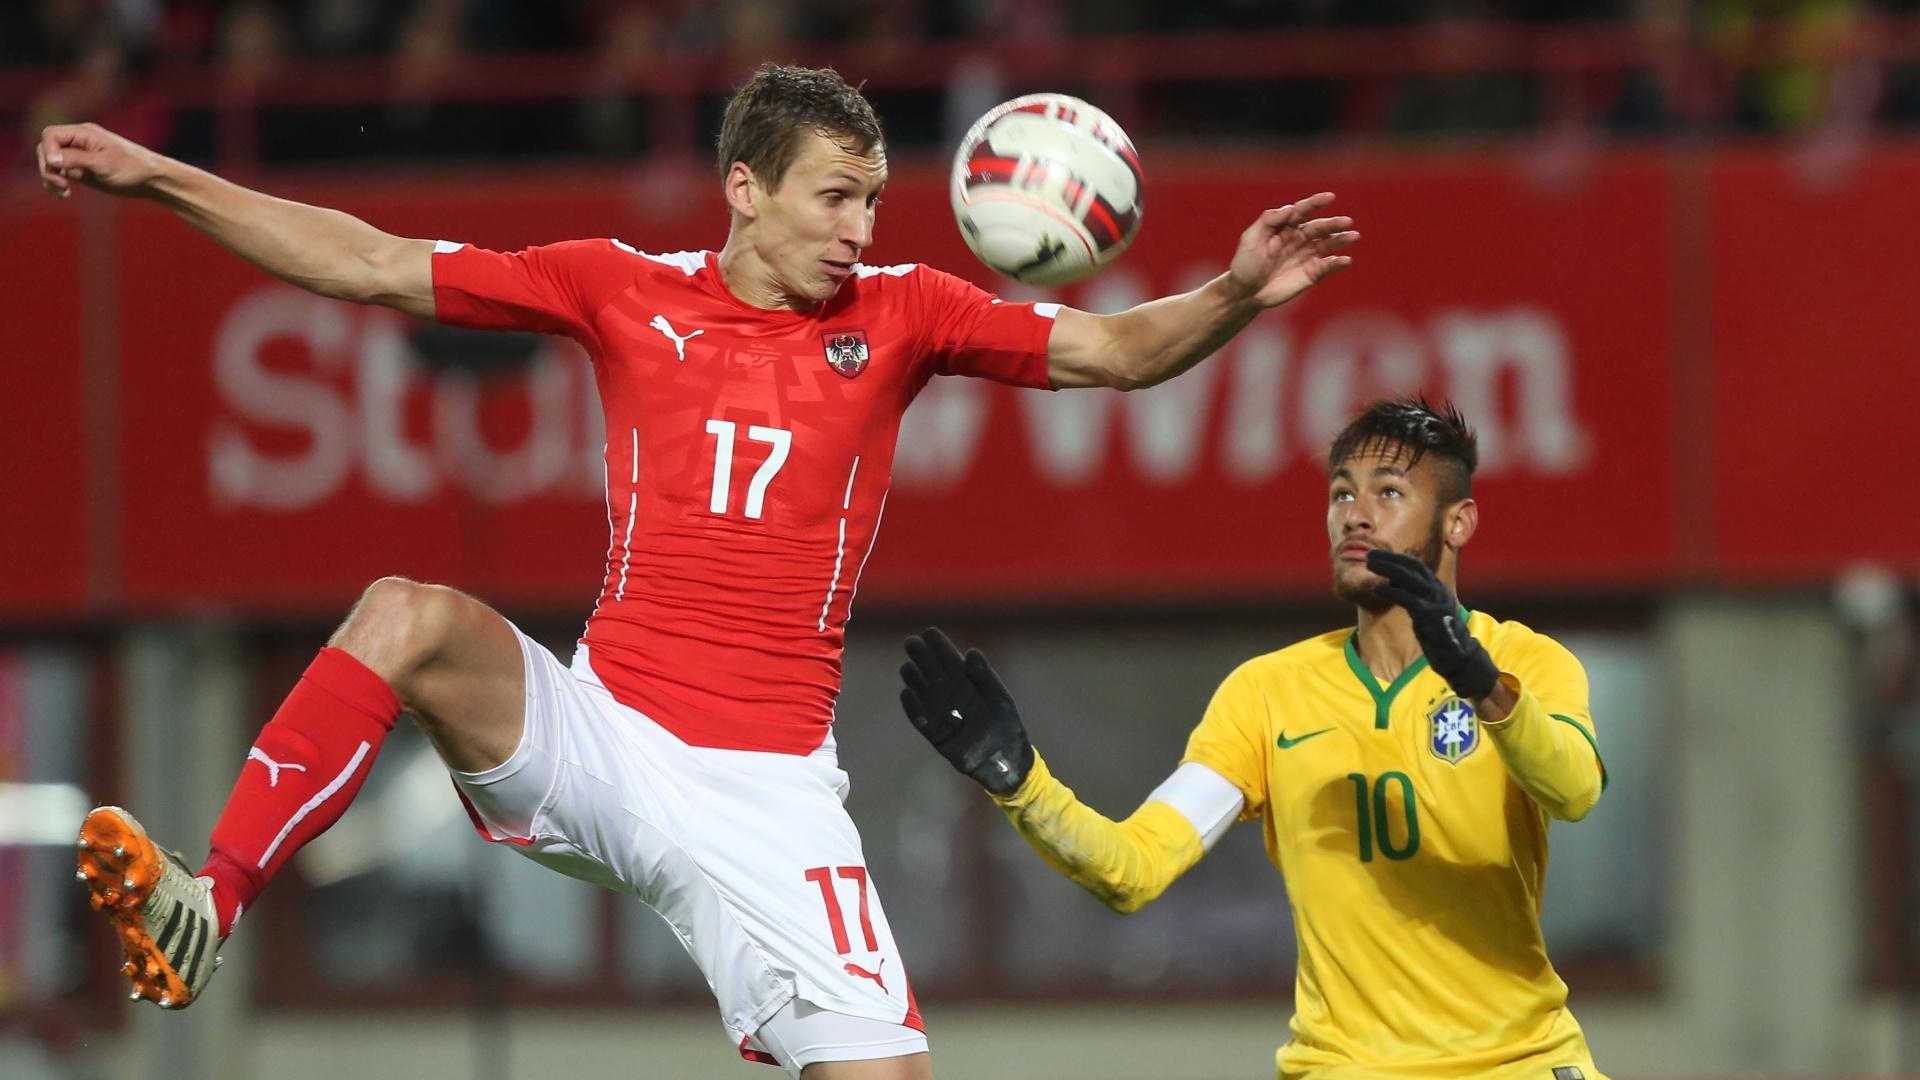 Neymar disputa bola pelo alto com austríaco Klein durante amistoso do Brasil